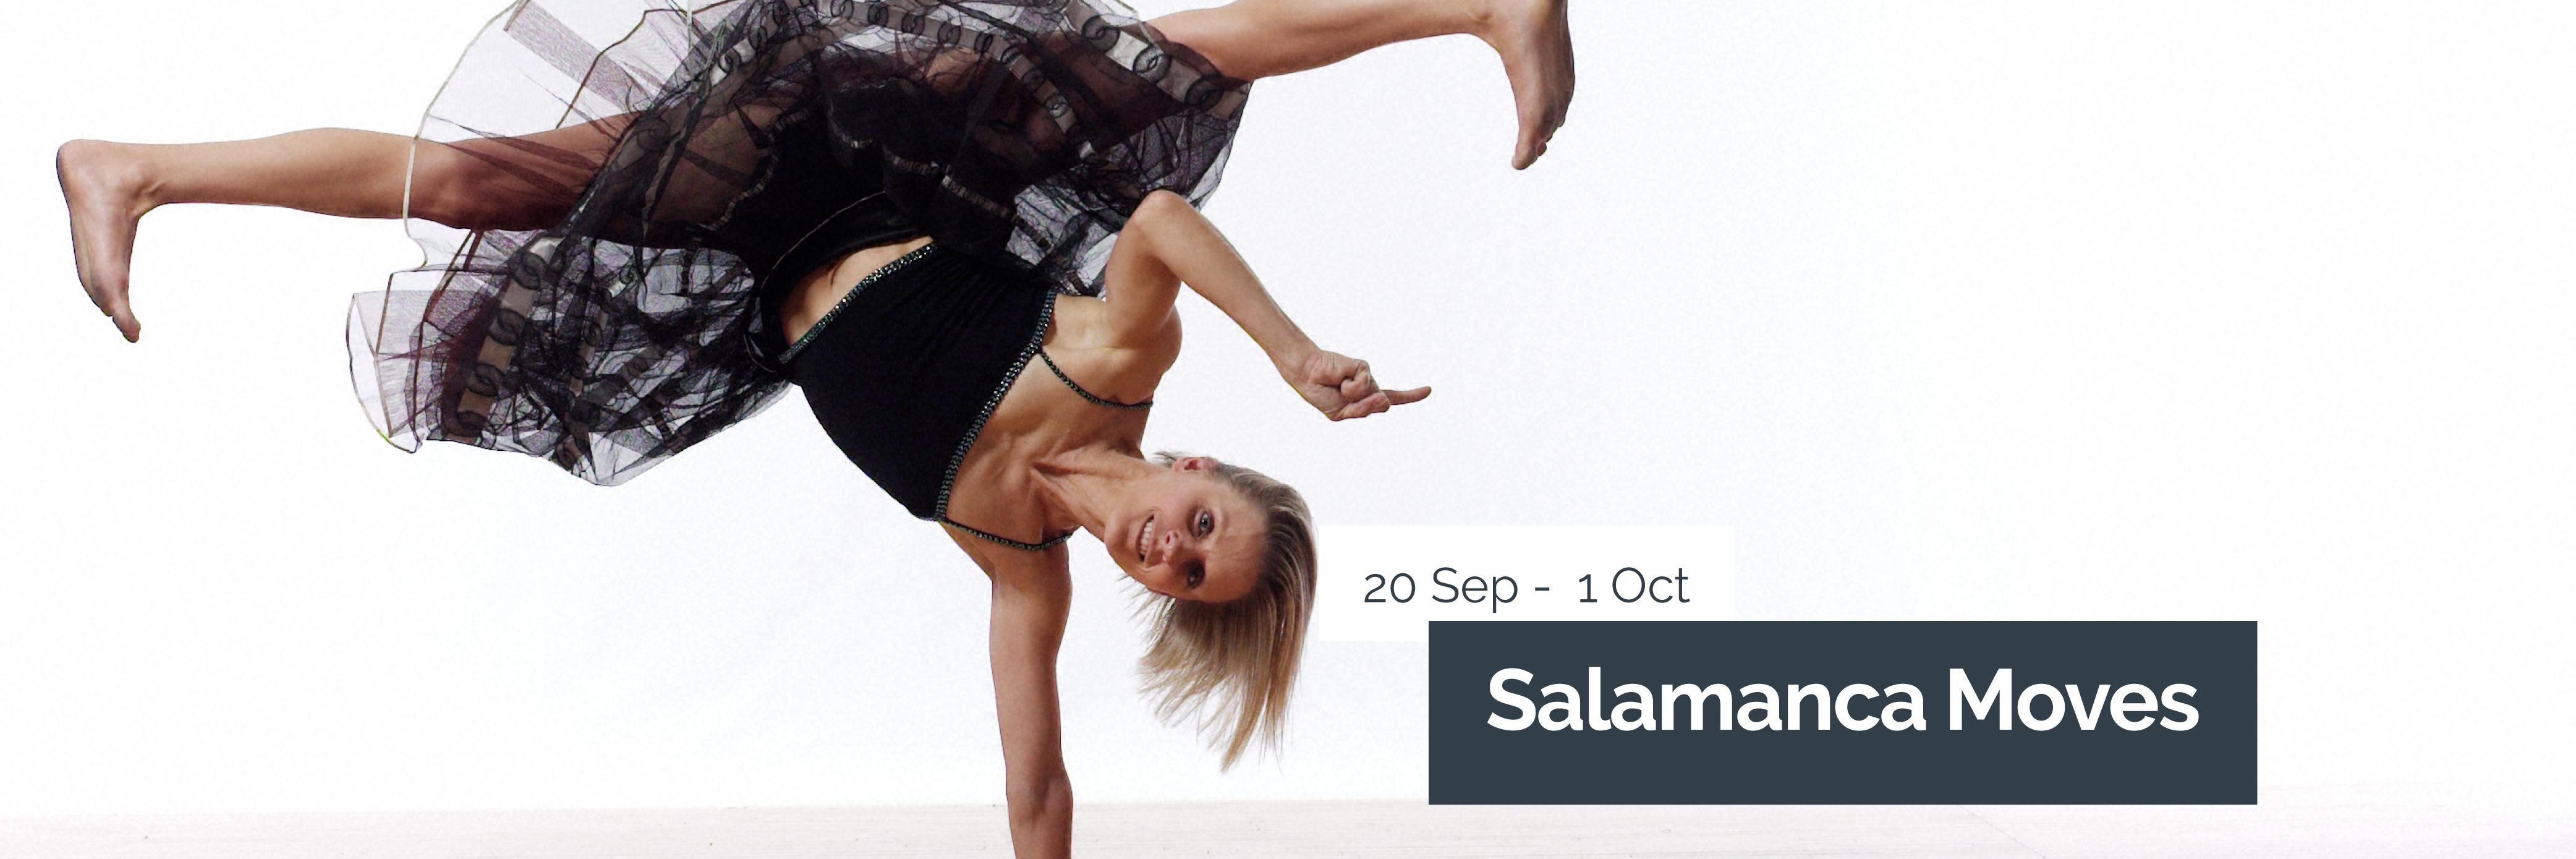 salamanca-moves-slider-ad